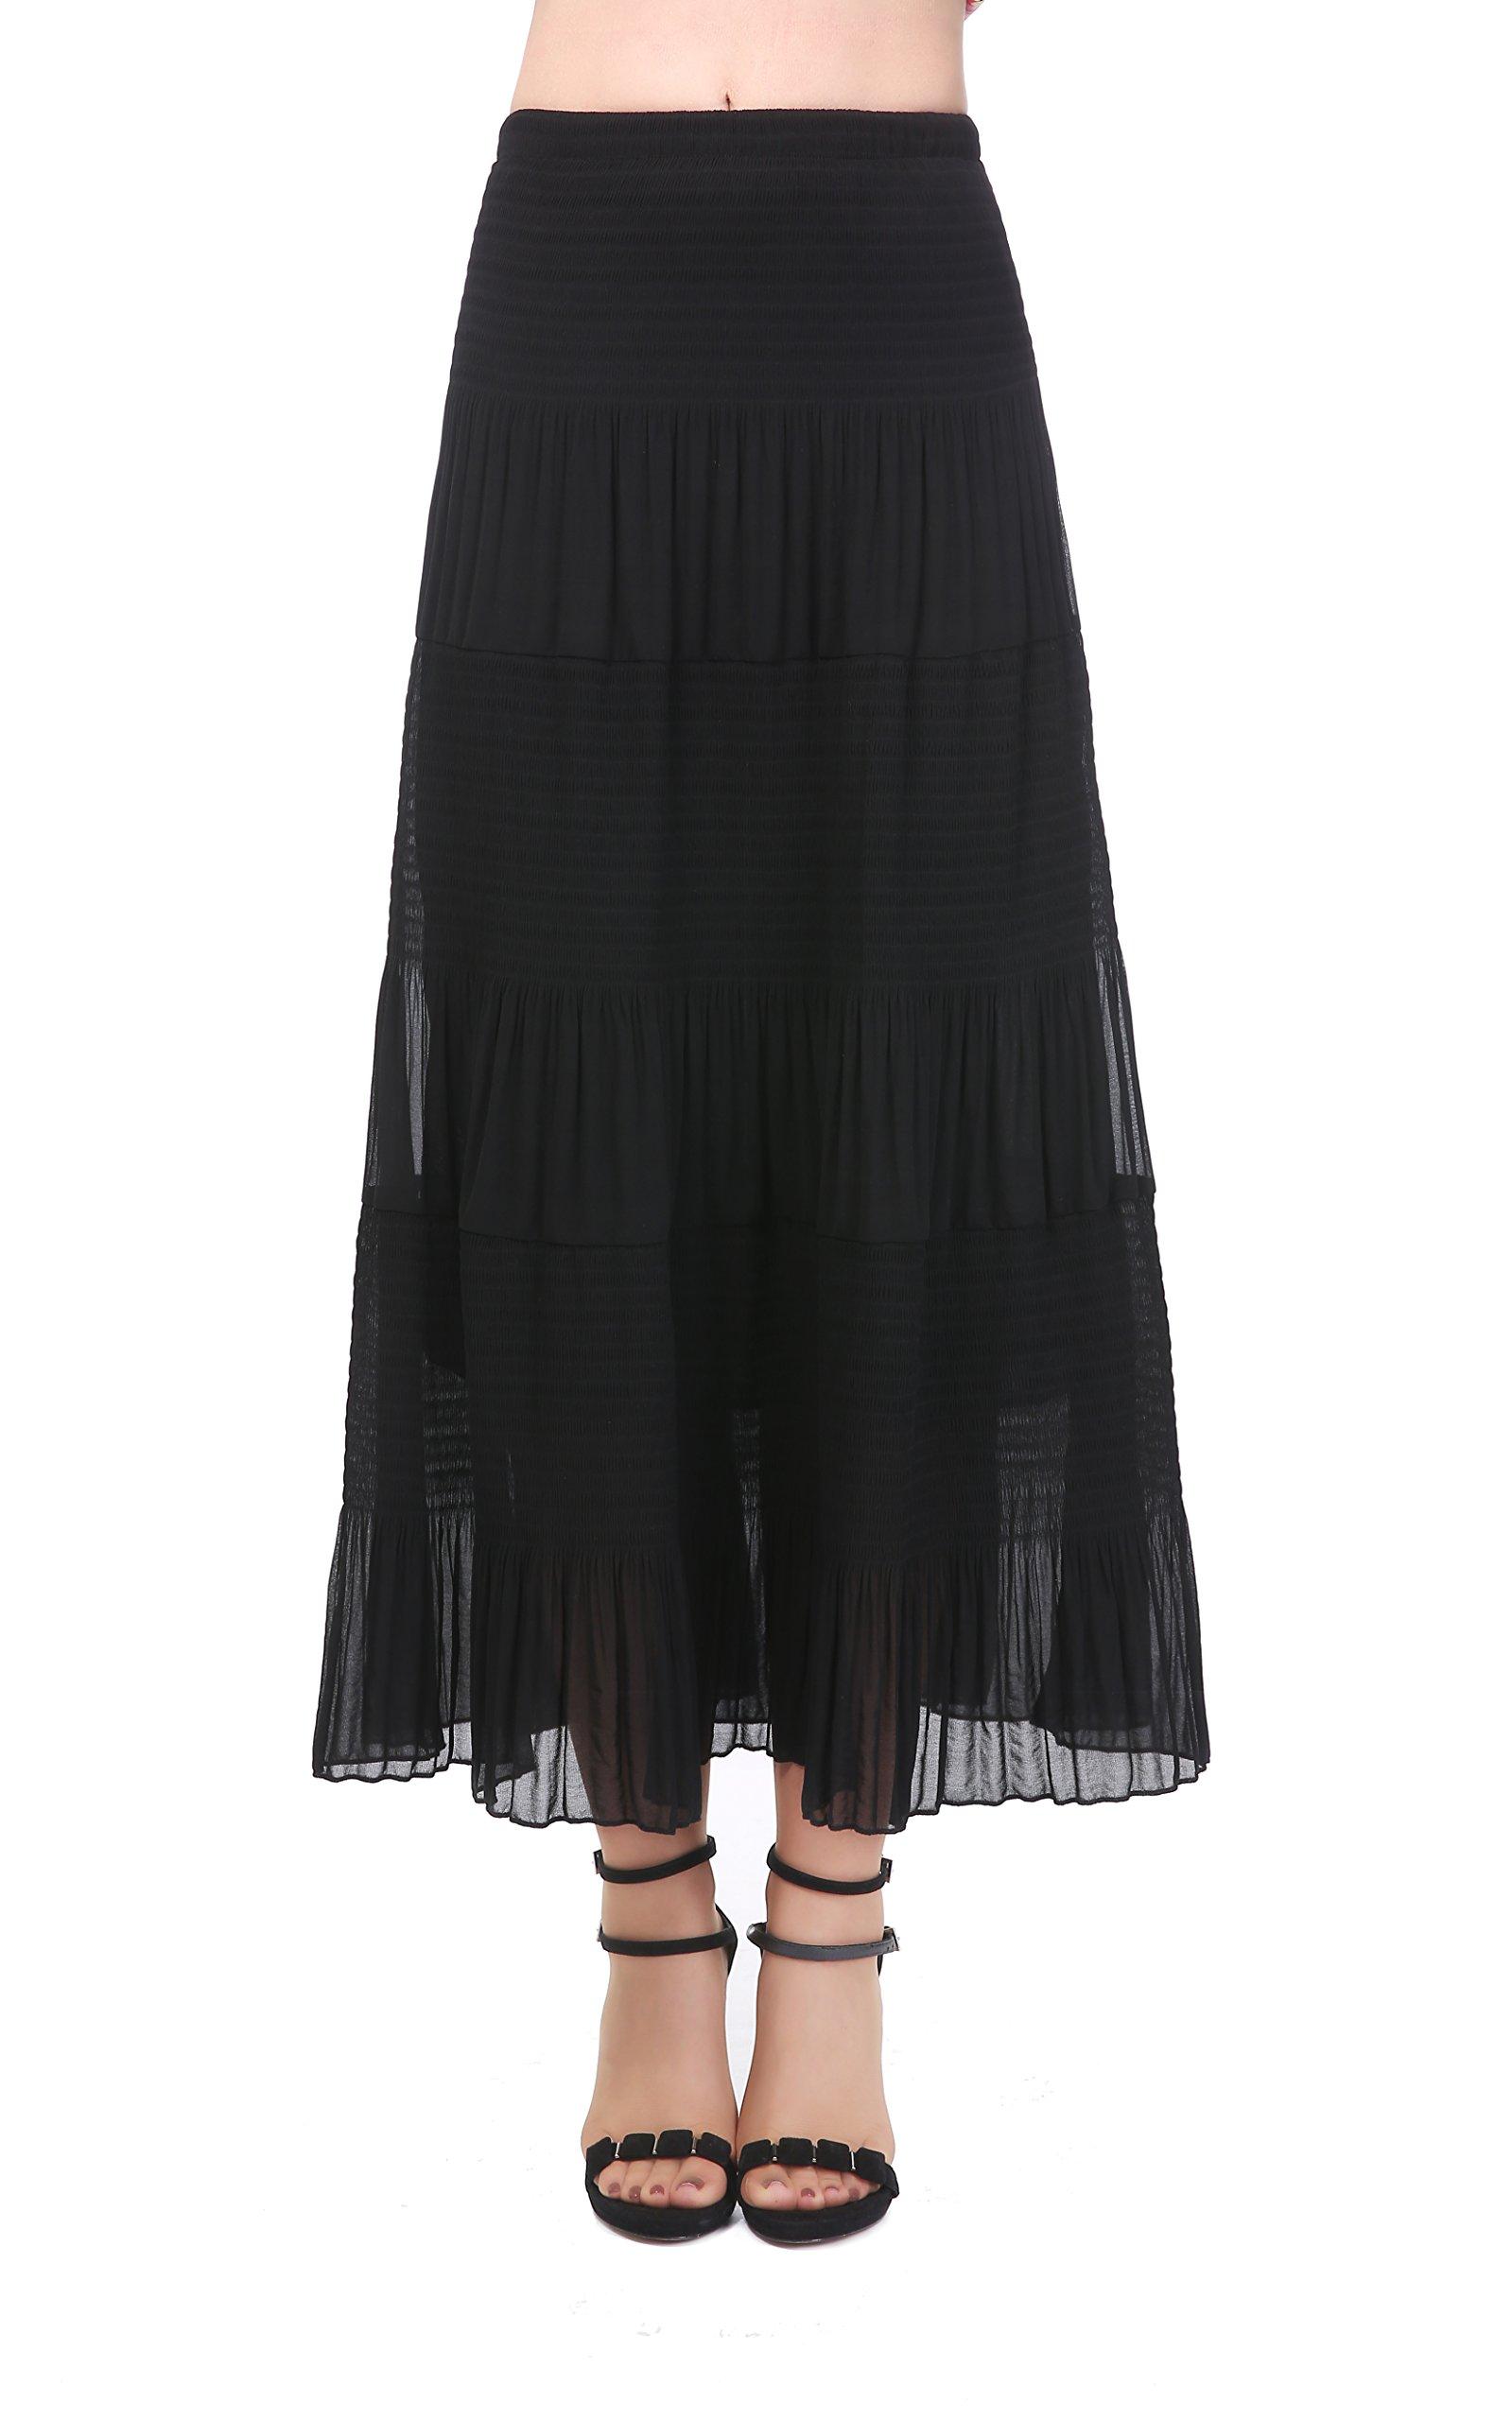 NASHALYLY Long Chiffon Skirts, Women's Bohemian Floral Print Pleated High Waist Beach Skirt (M, Black)